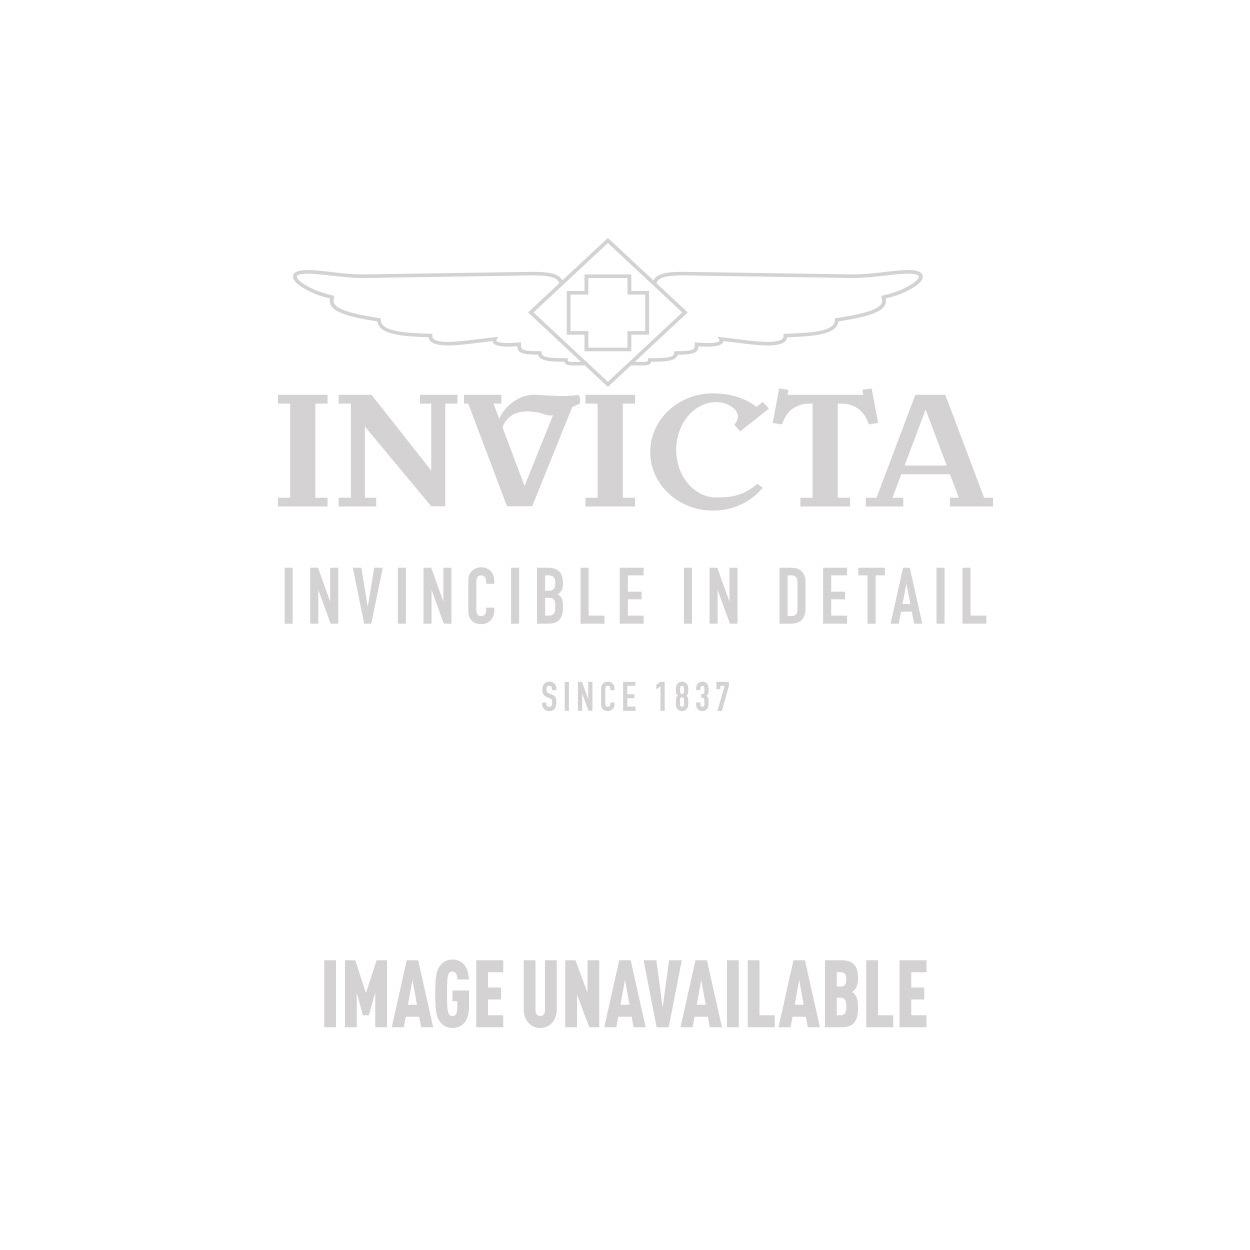 Invicta I-Force Swiss Movement Quartz Watch - Gunmetal case with Black tone Leather band - Model 0354